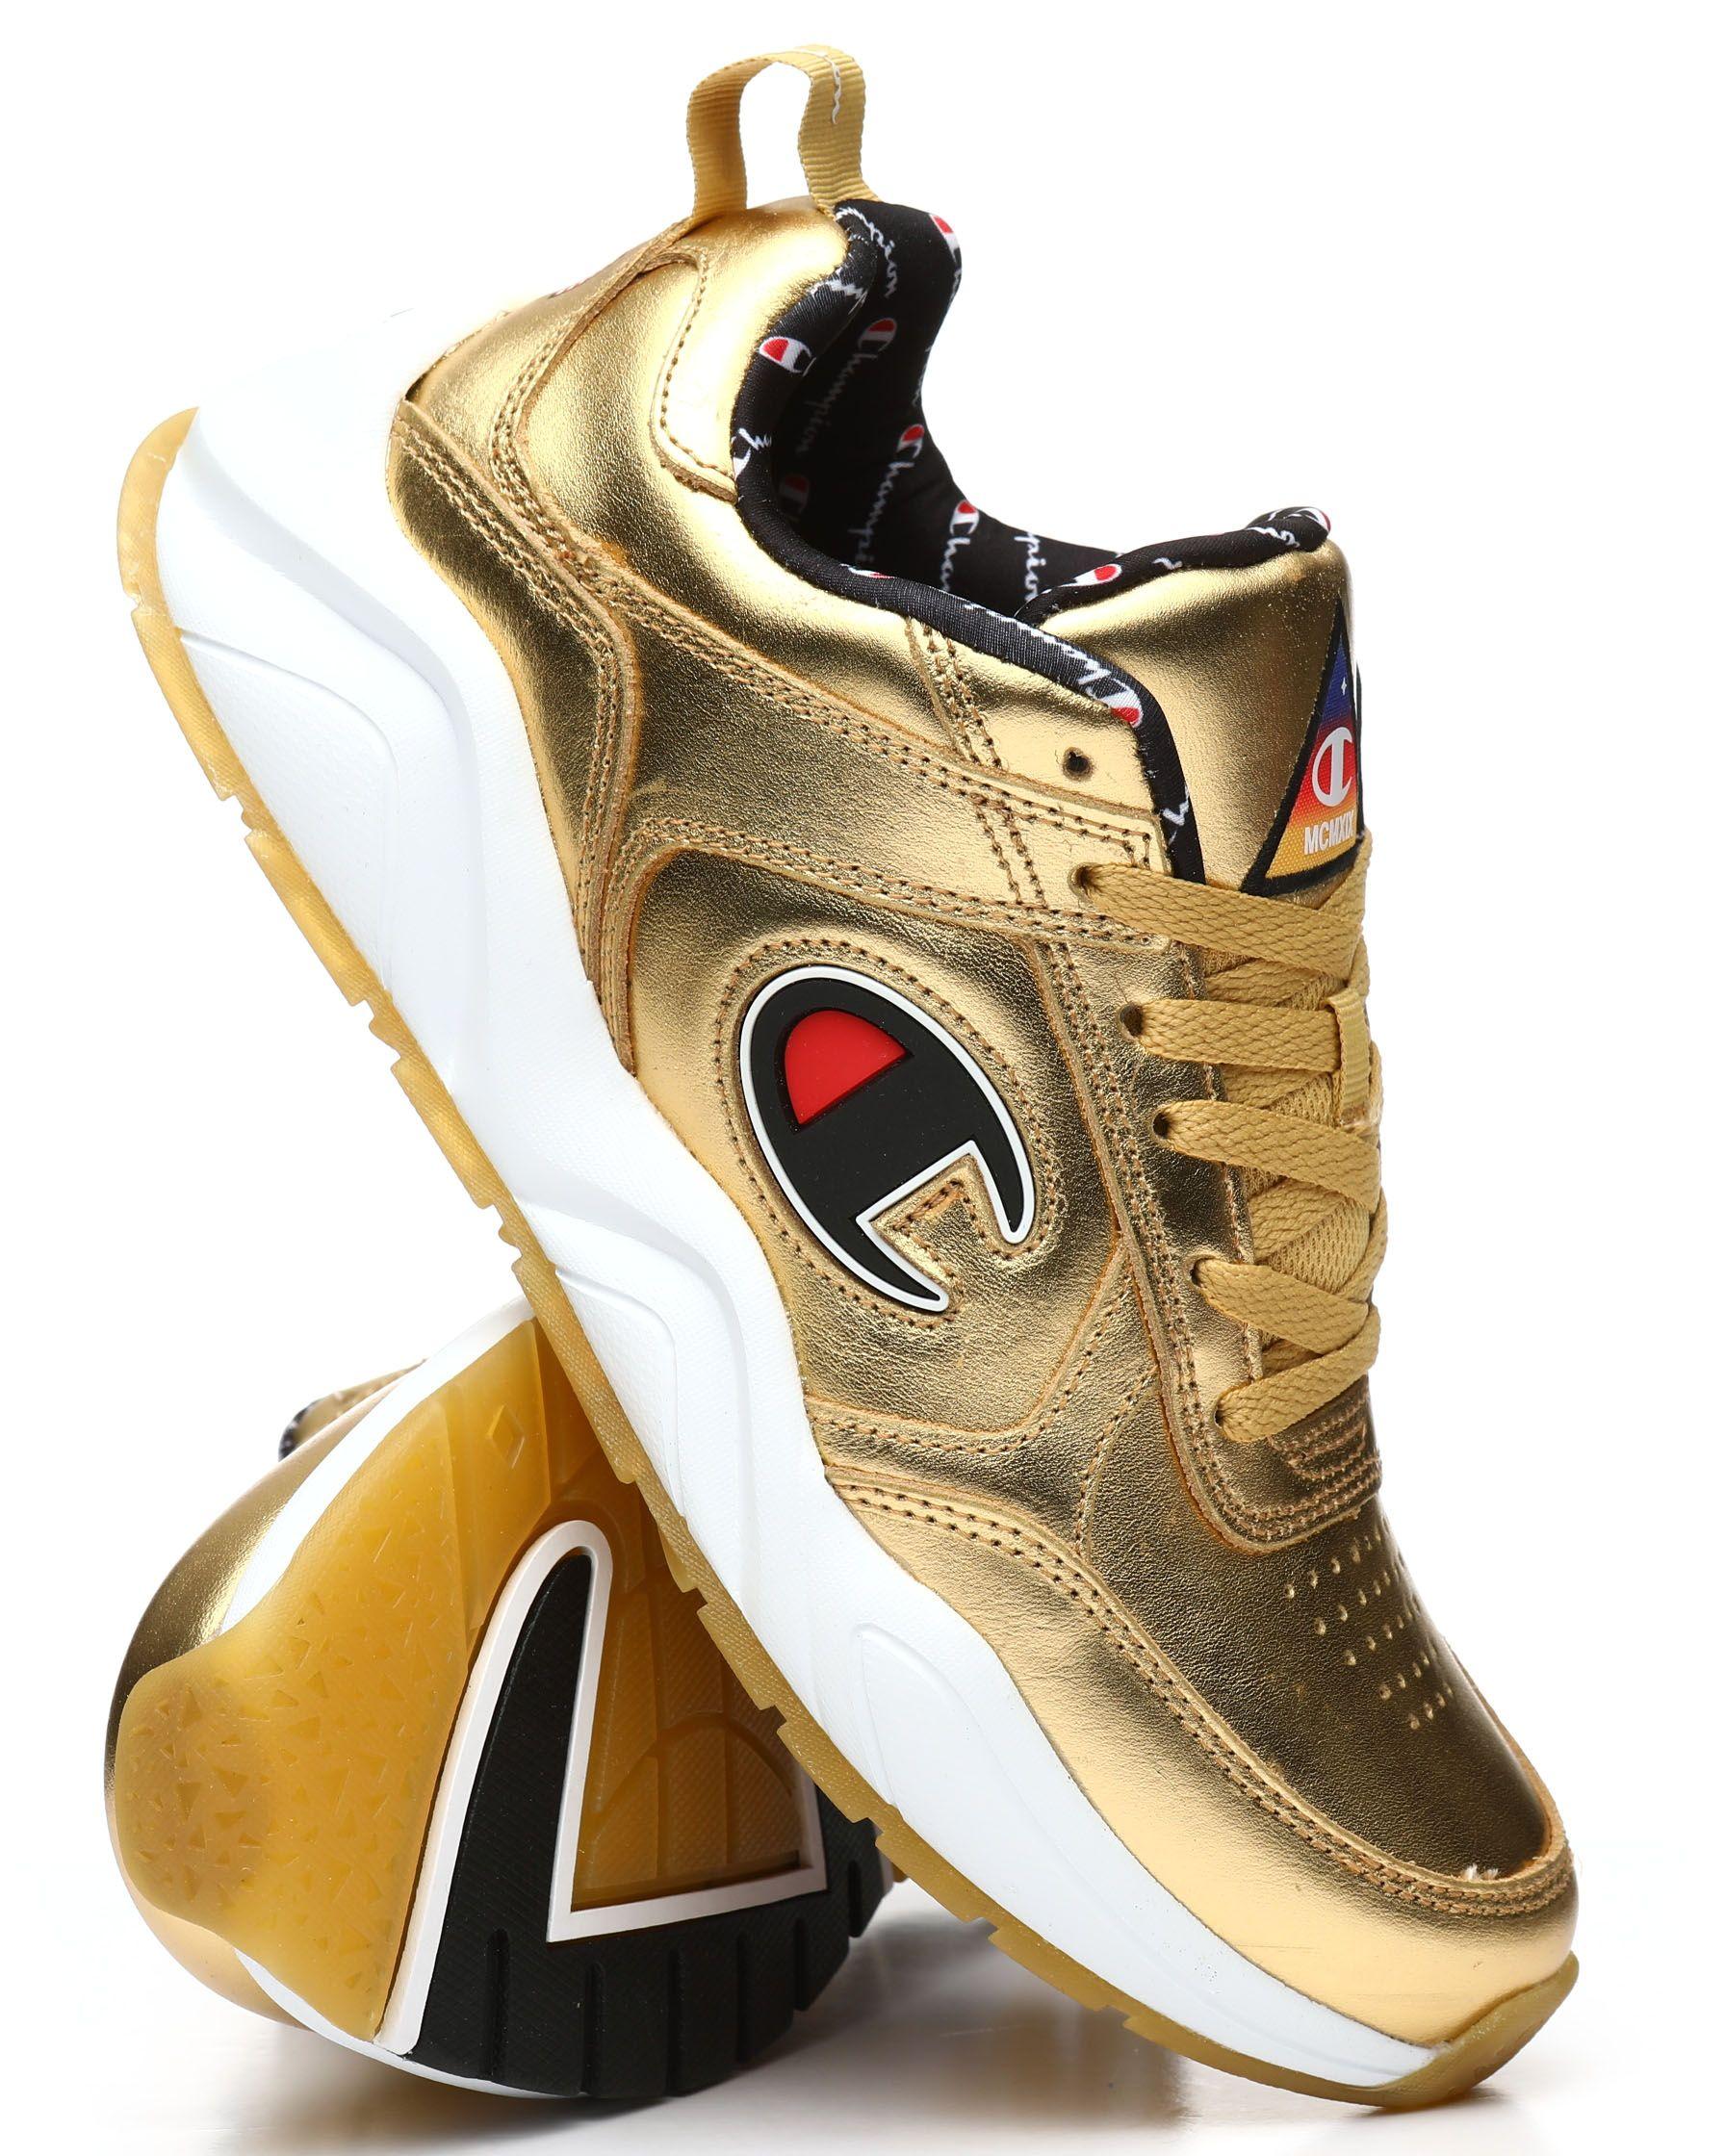 6c8e32c46b4 93Eighteen Metallic Sneakers from Champion at DrJays.com